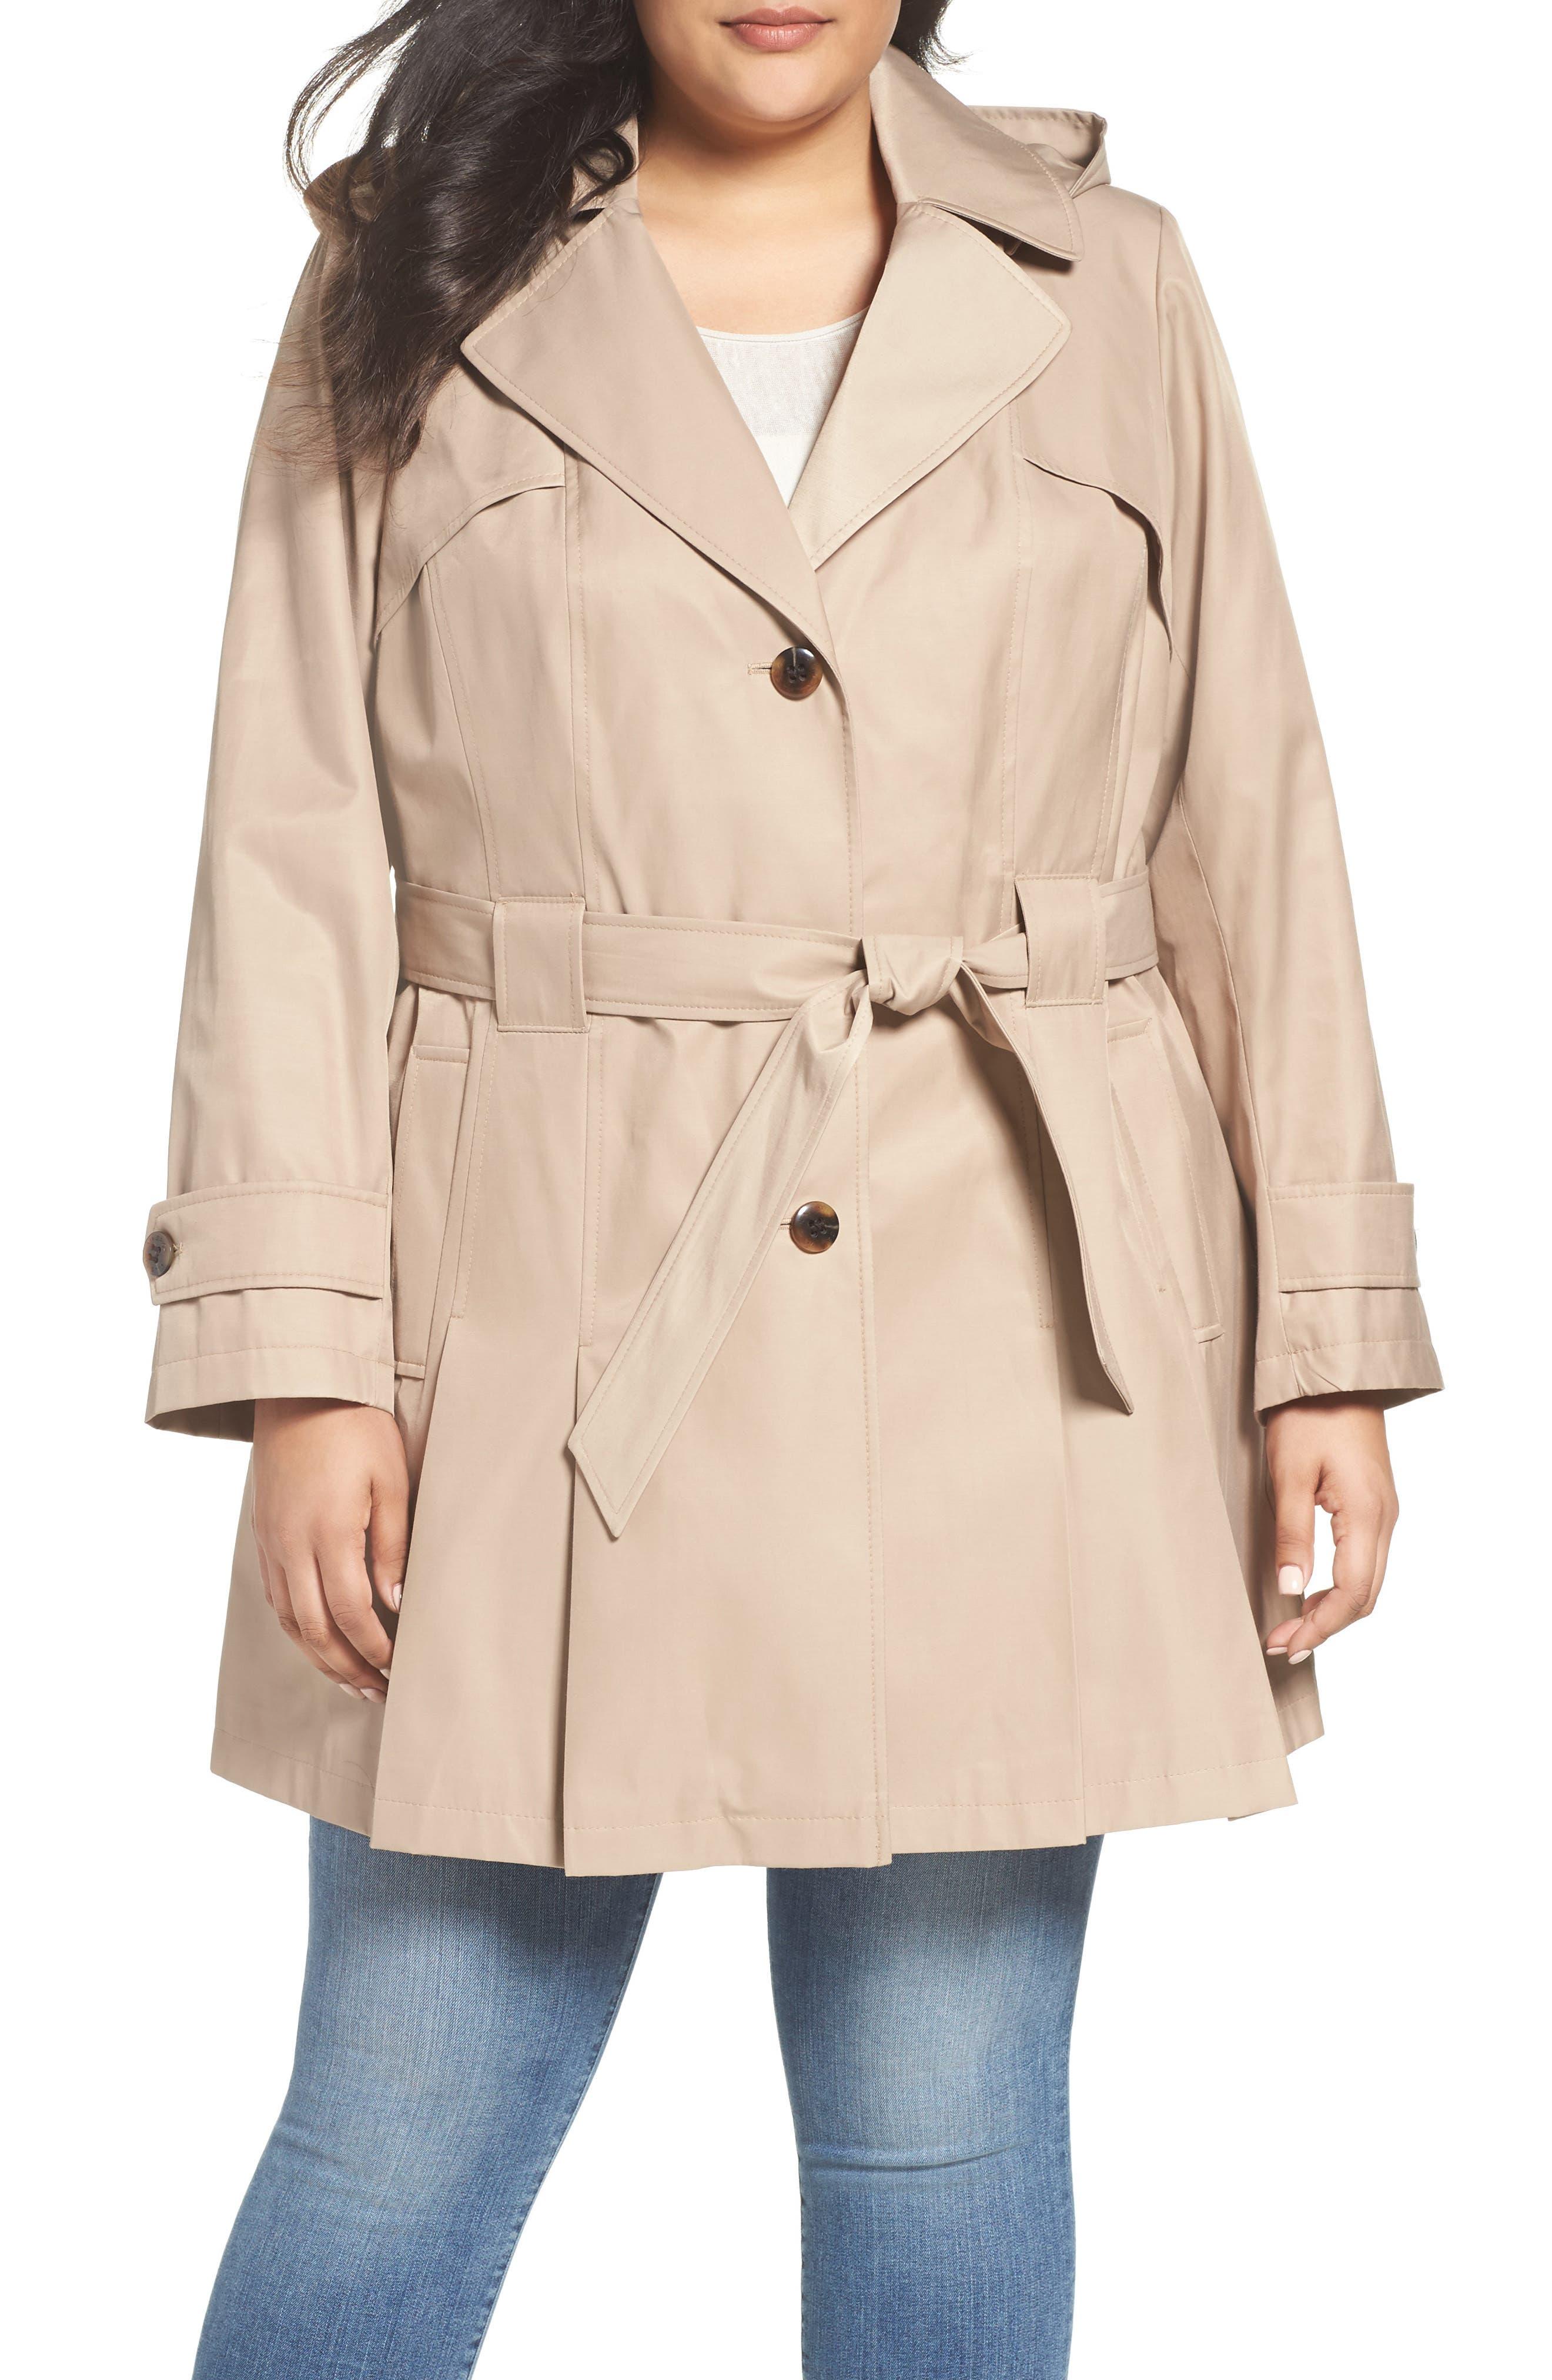 'Scarpa' Single Breasted Trench Coat,                             Main thumbnail 3, color,